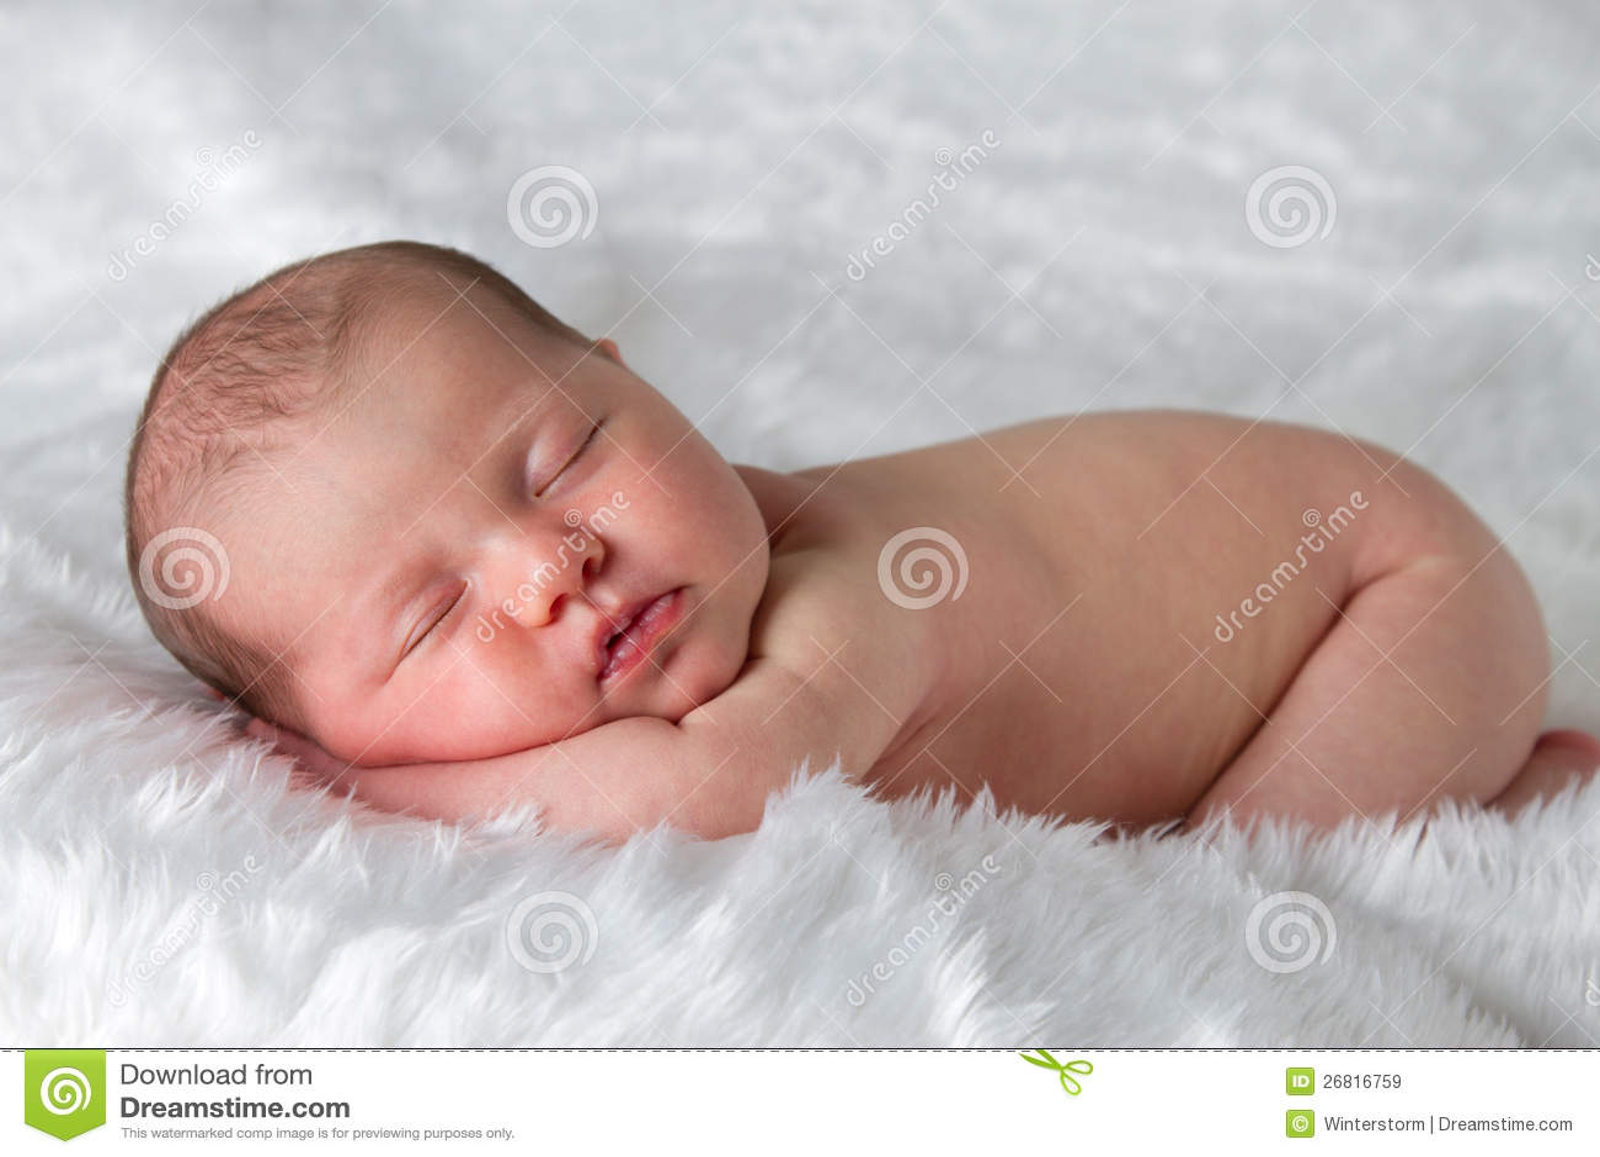 Born free baby